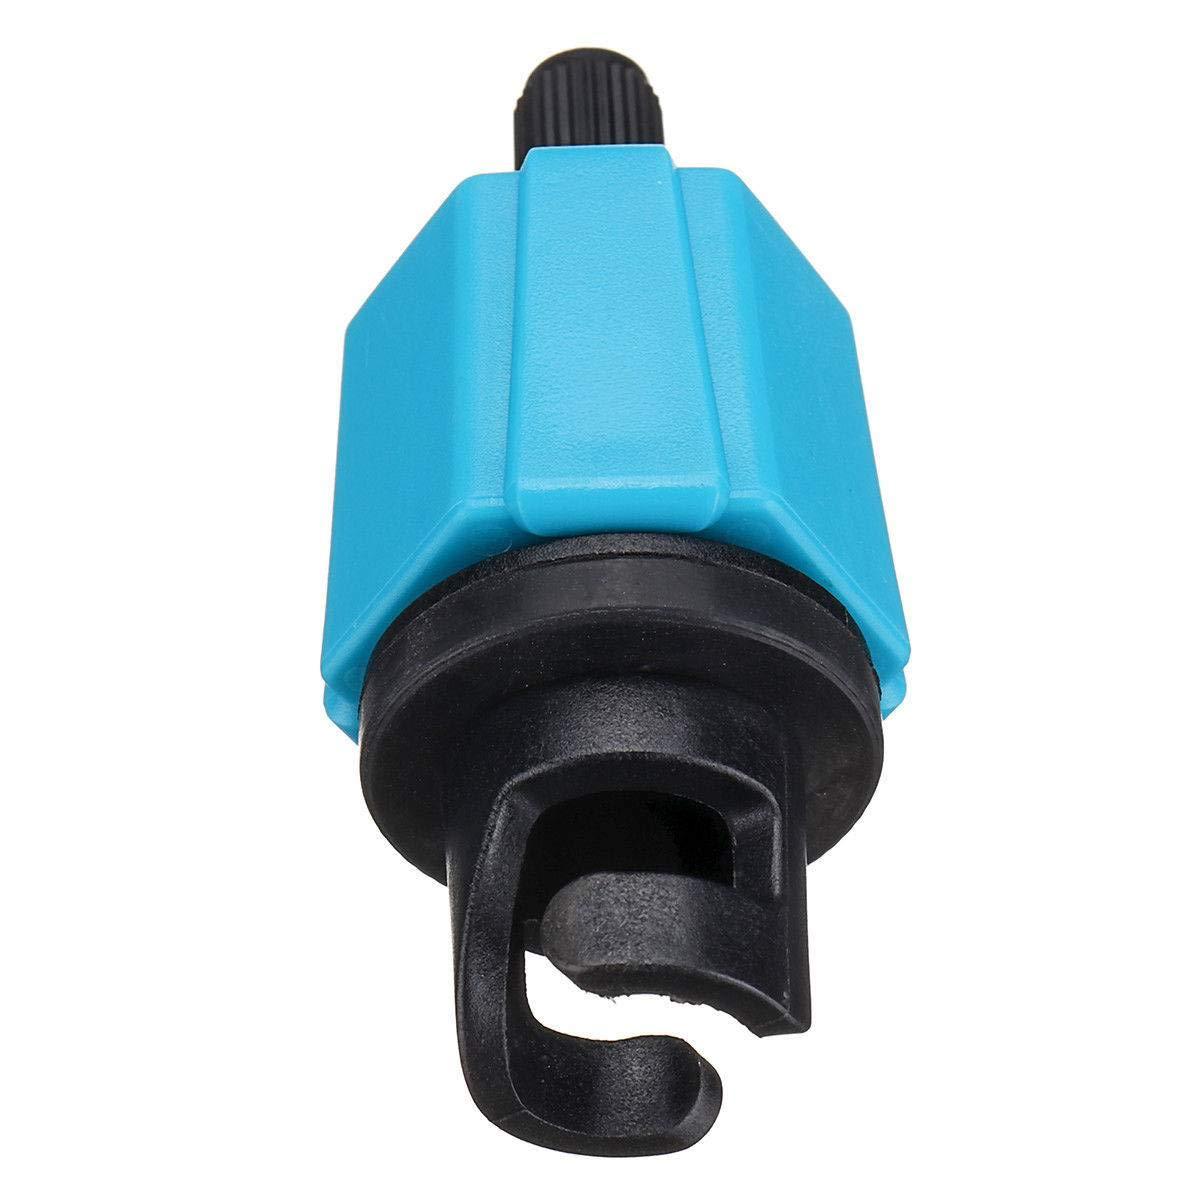 Aufblasbare Bootspumpe Ventil Adapter Sup Air Ventil Paddel Board Zubeh/ör